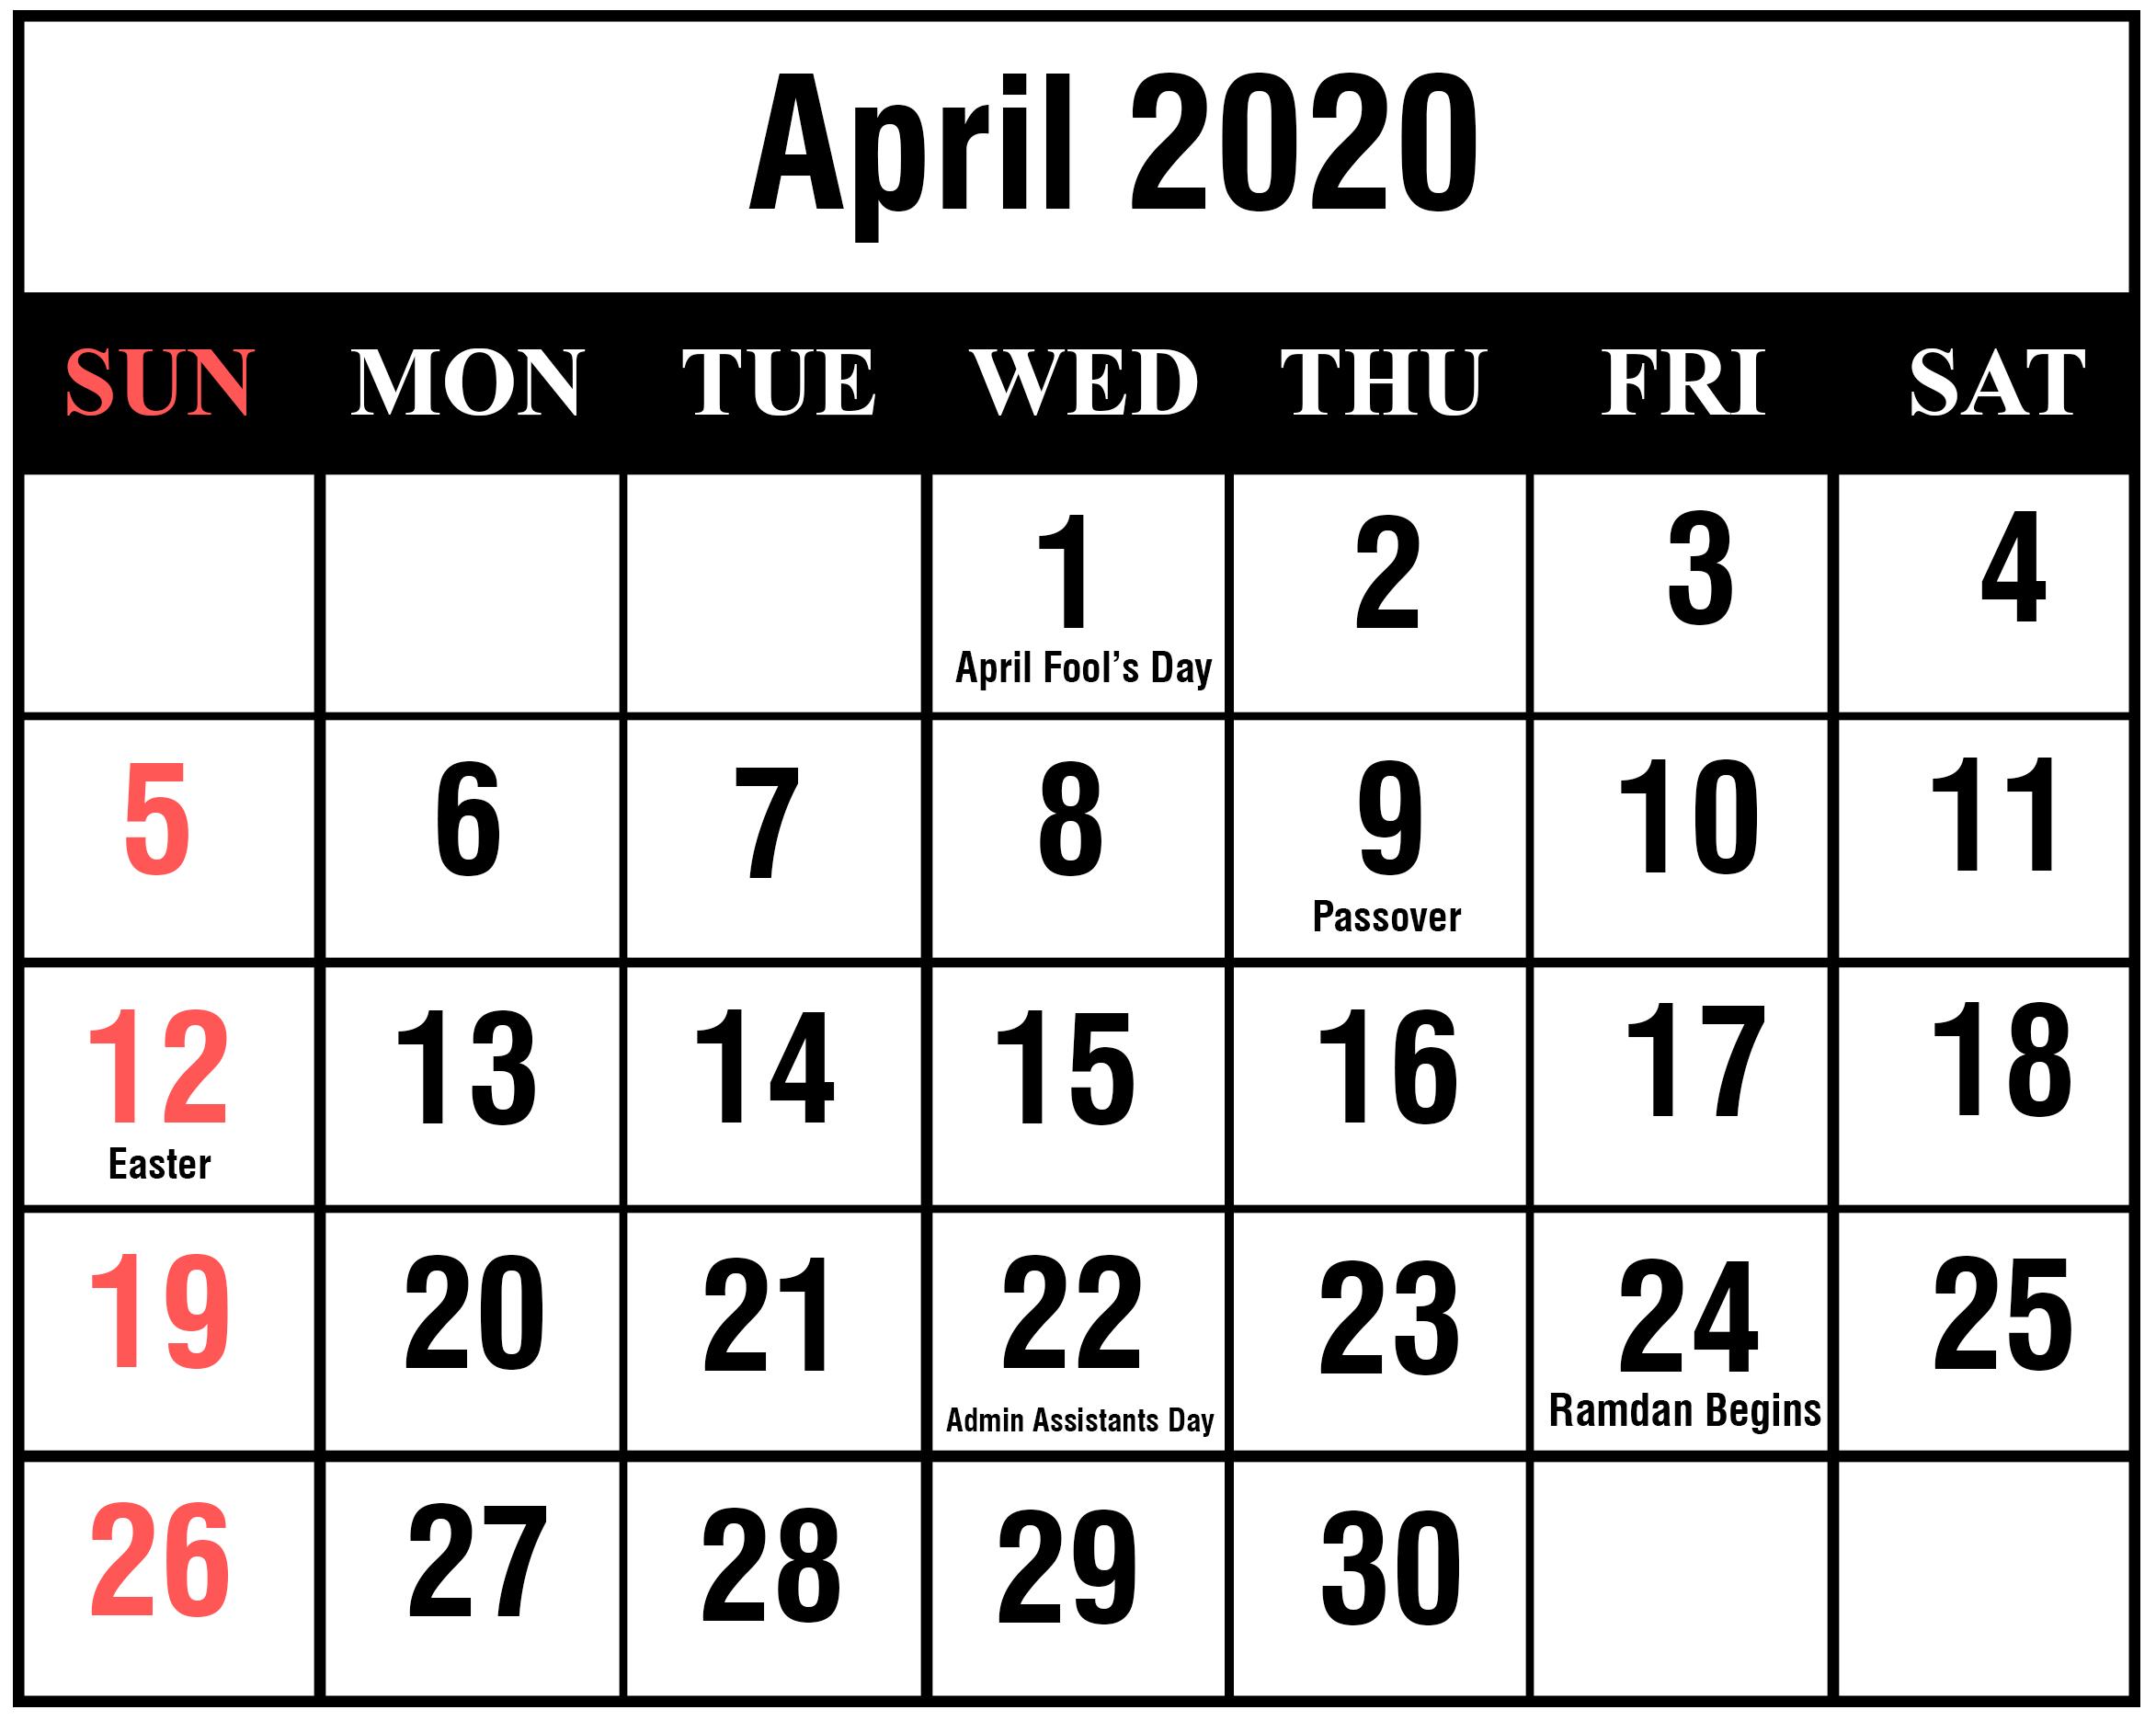 April 2020 Calendar PDF